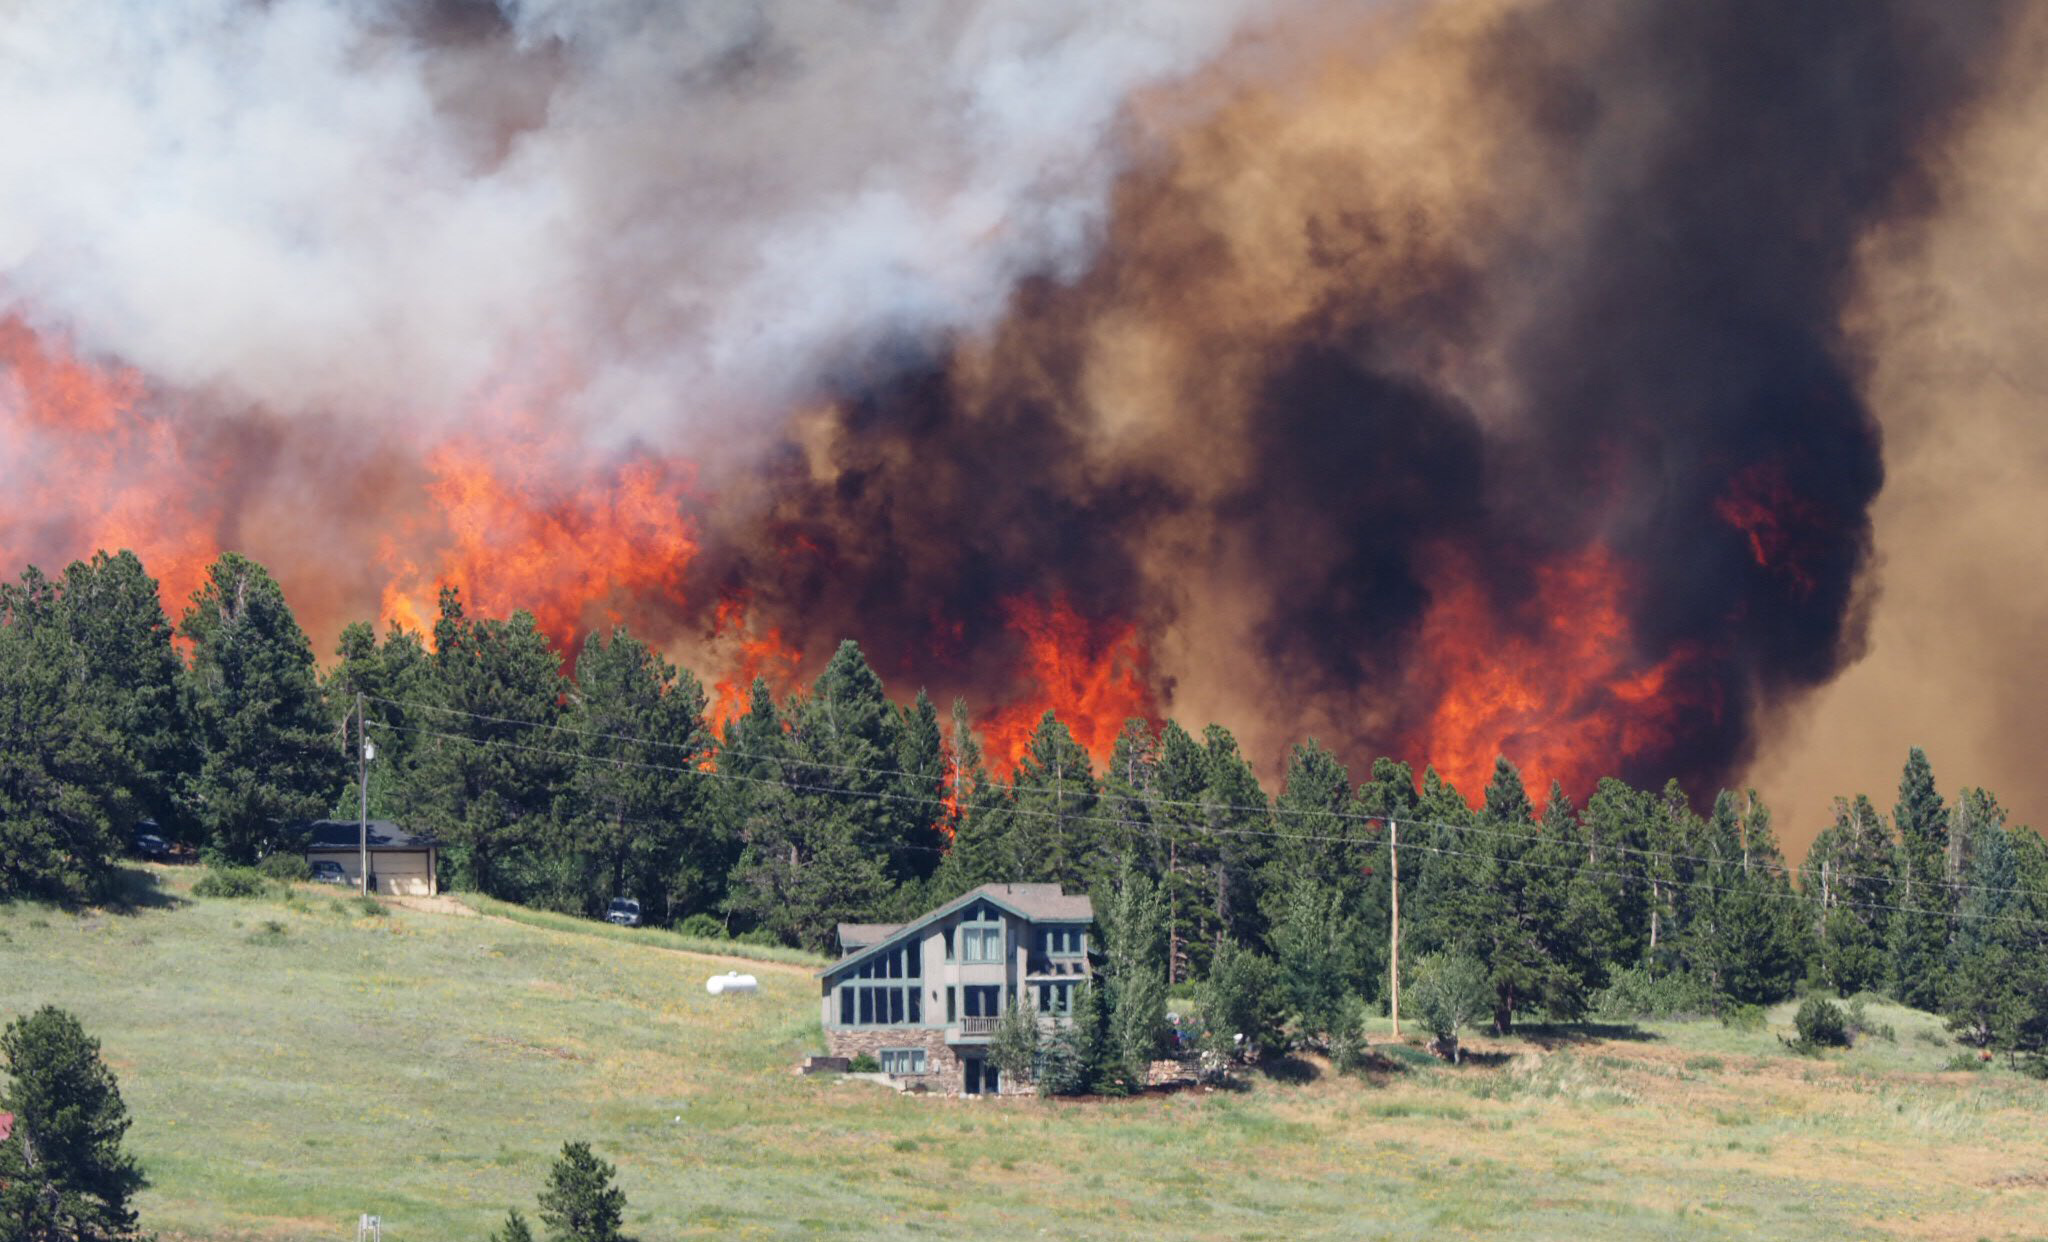 Colorado Wildfires Spread To 330 Acres 1 000 Residents